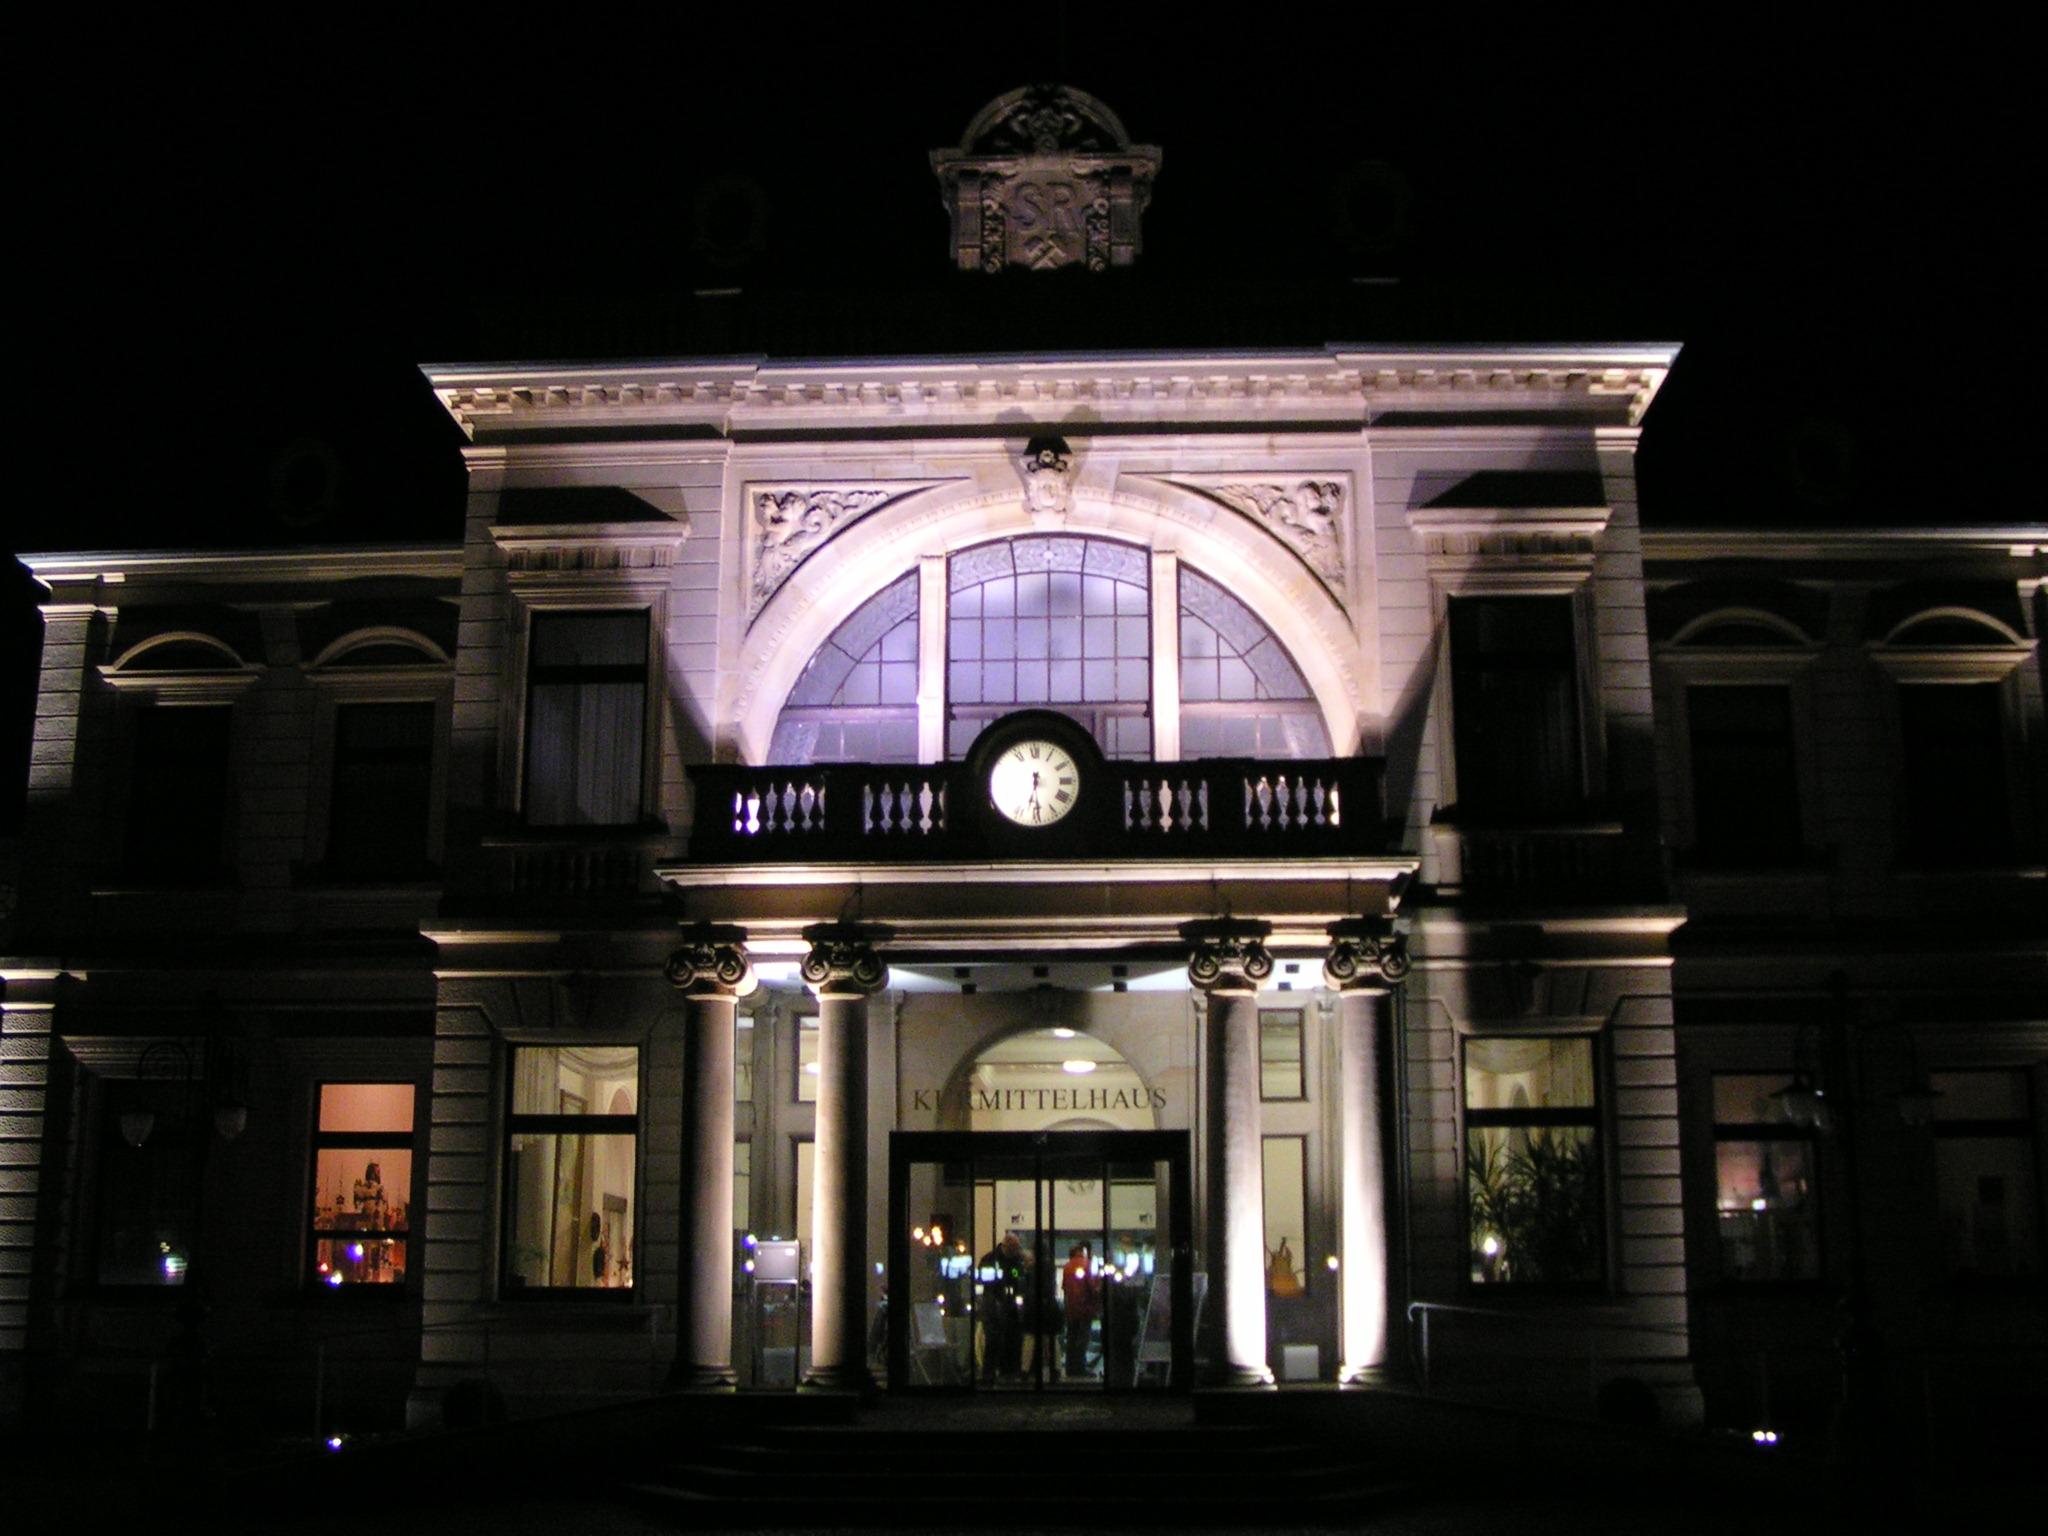 Kurlichtspiele Bad Rothenfelde